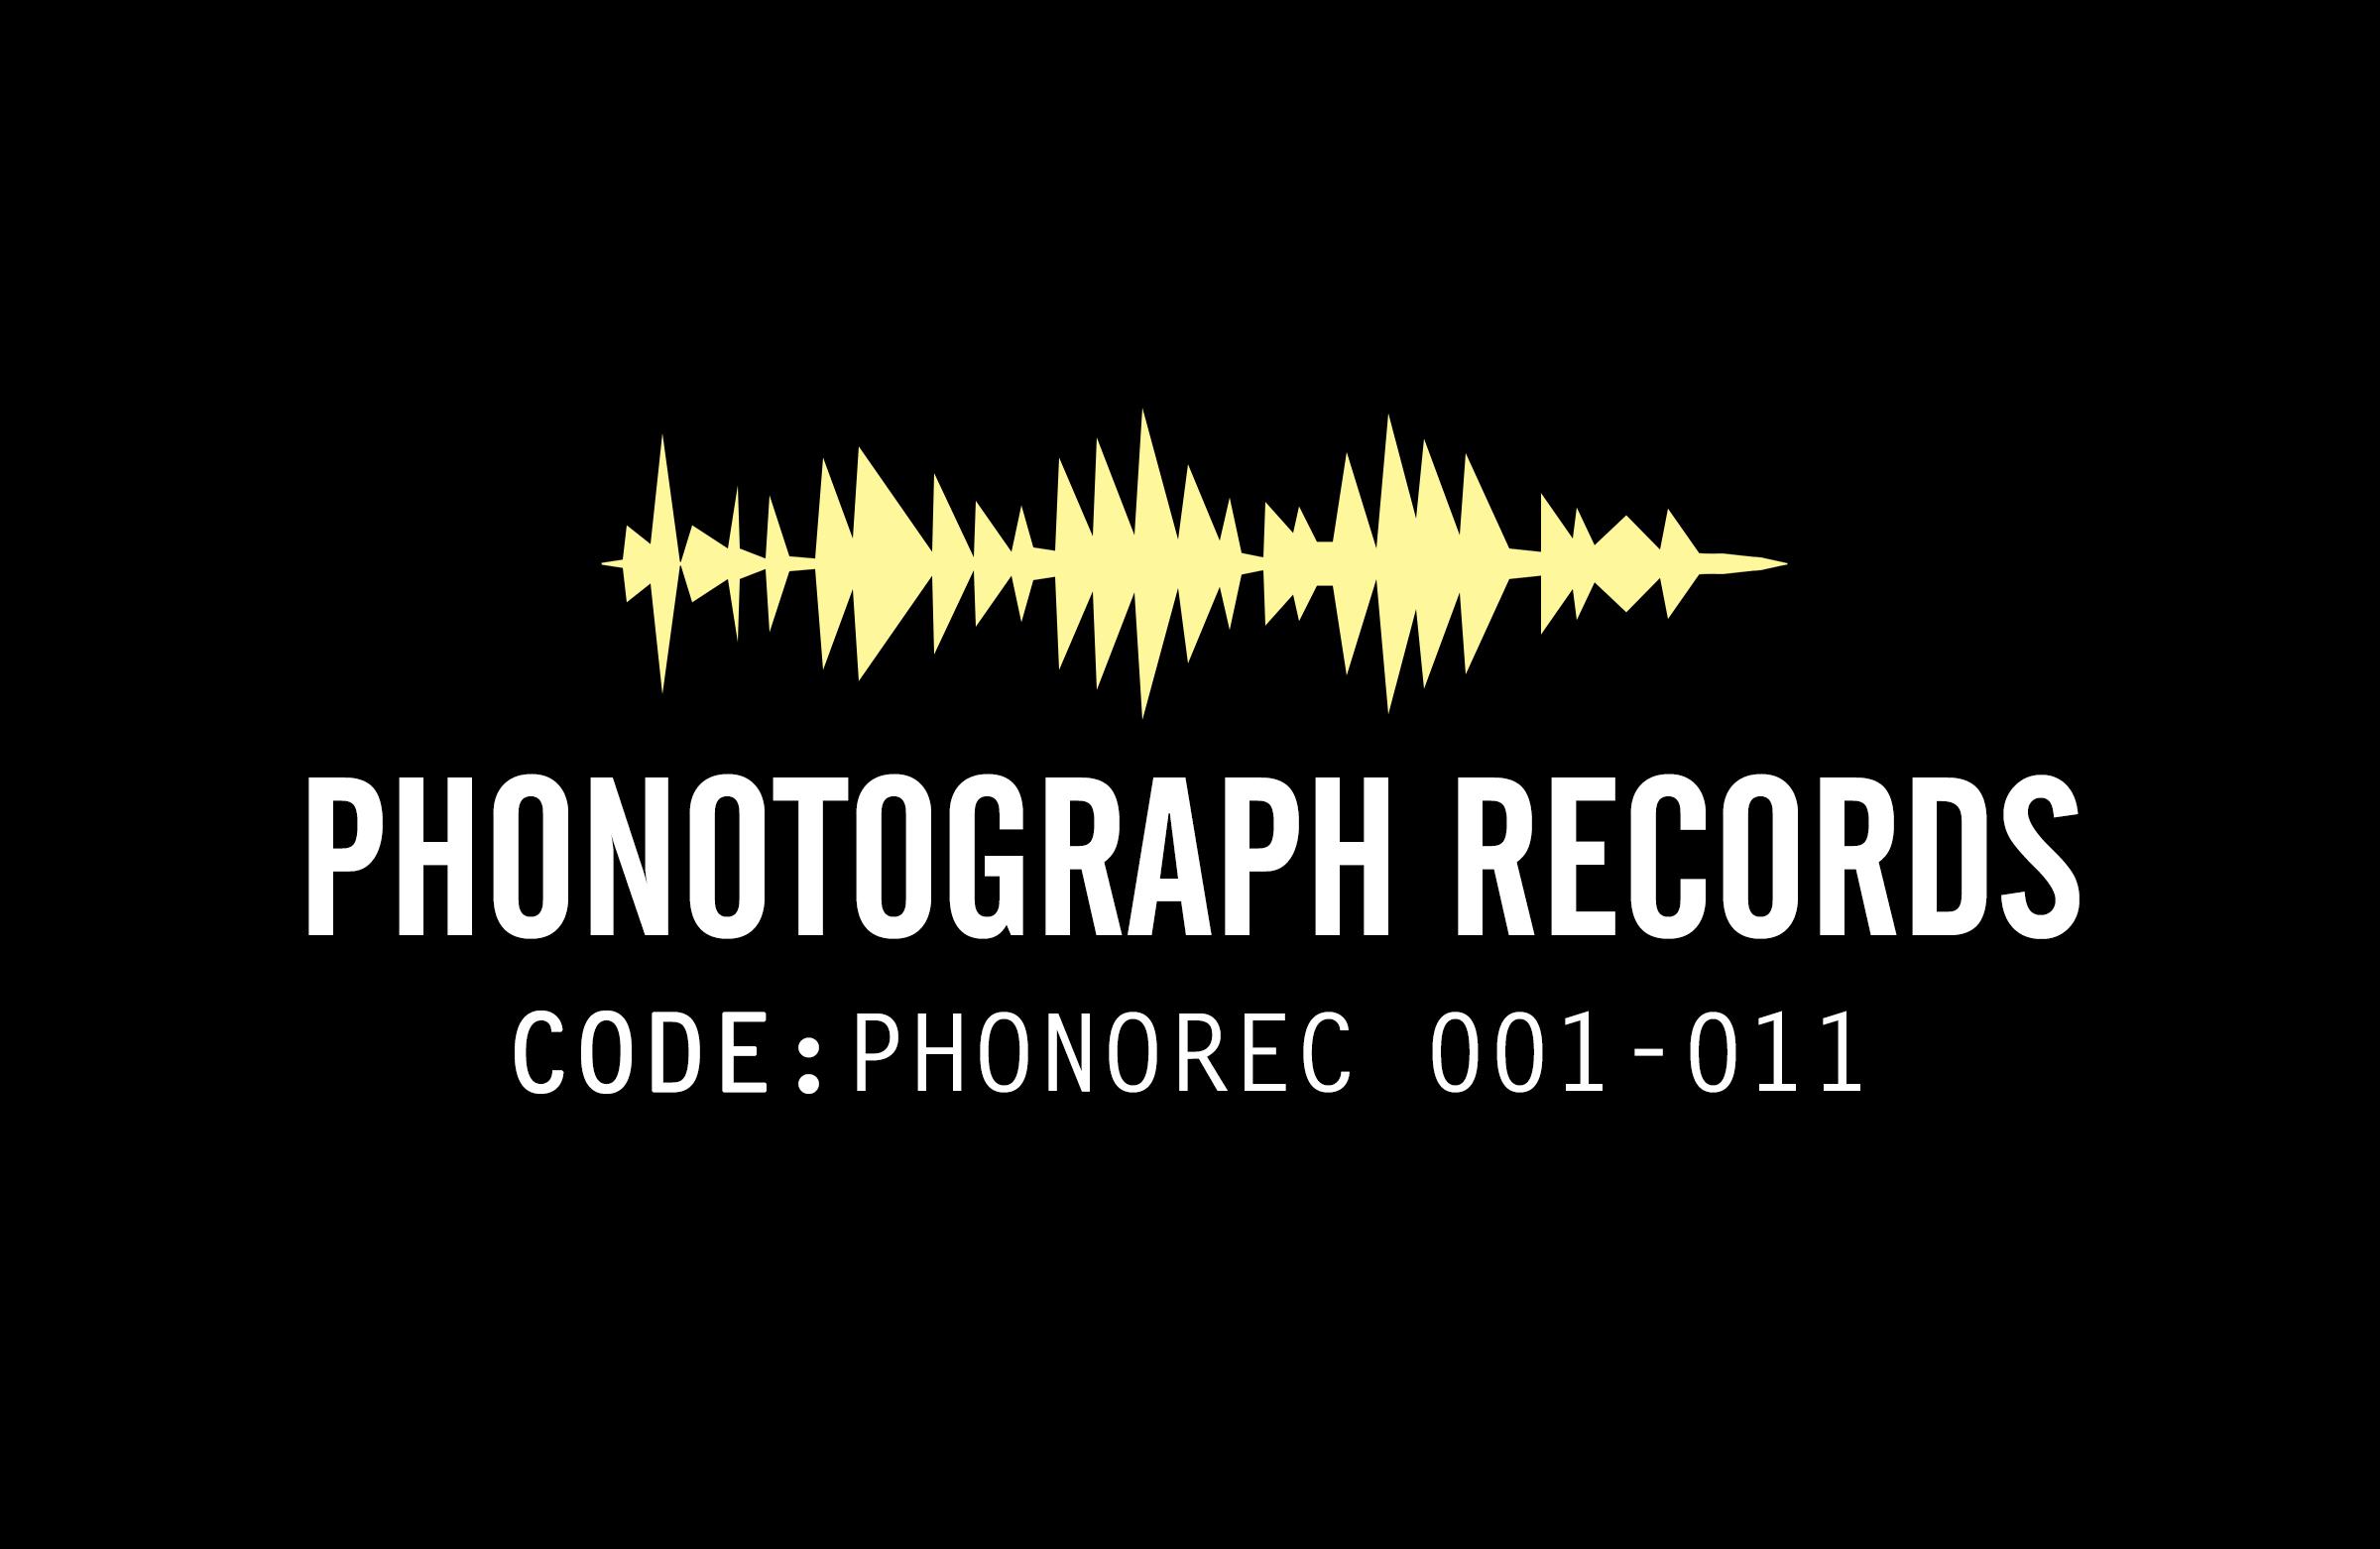 logo phonotograph records 2 copy.jpg